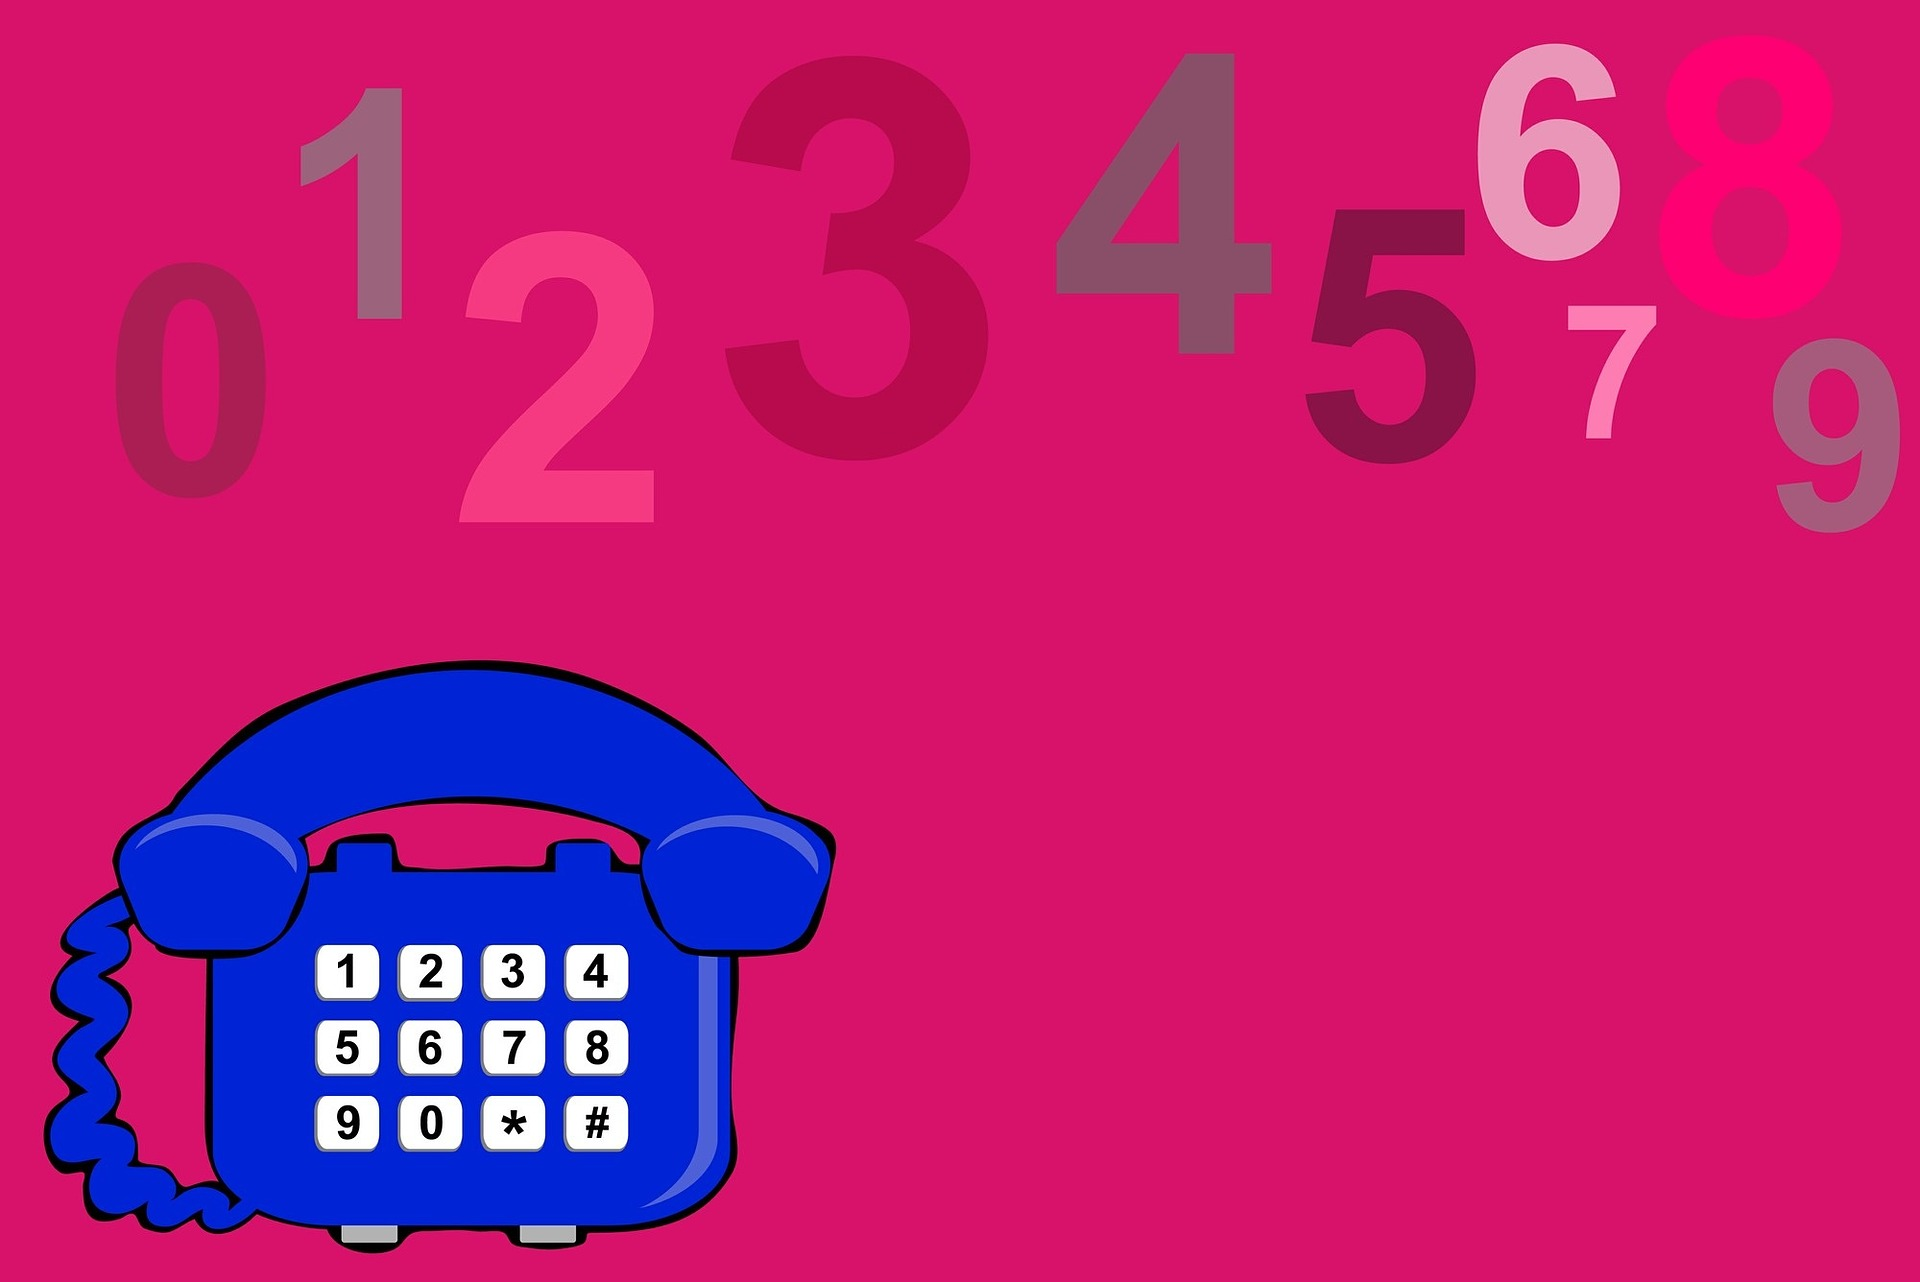 SMSコードの確認のための電話番号